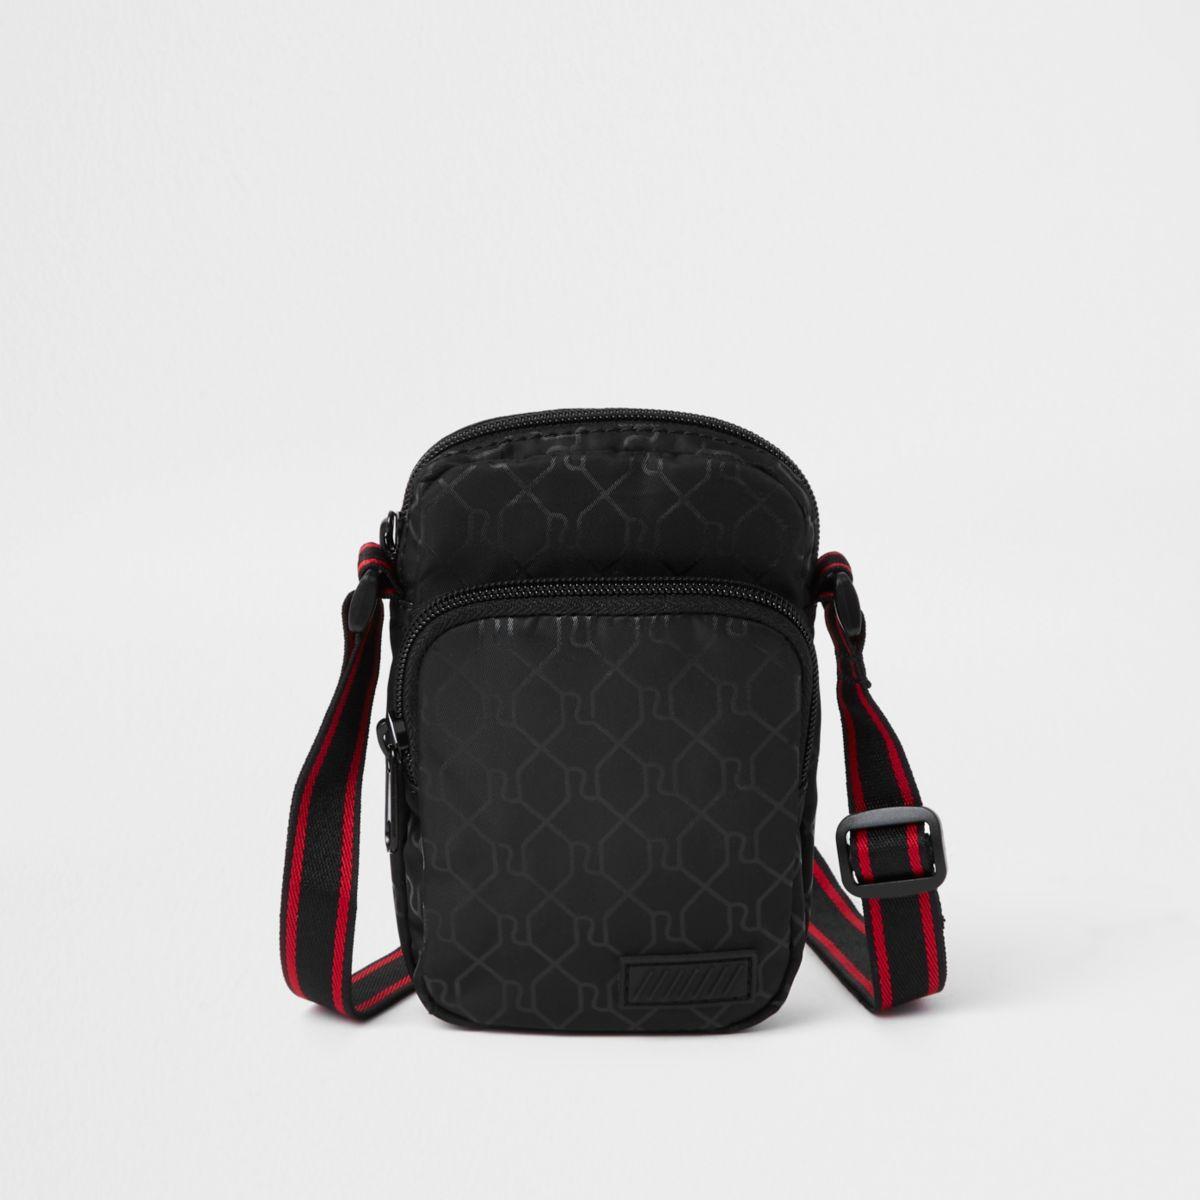 Black mini cross body RI flight pouch